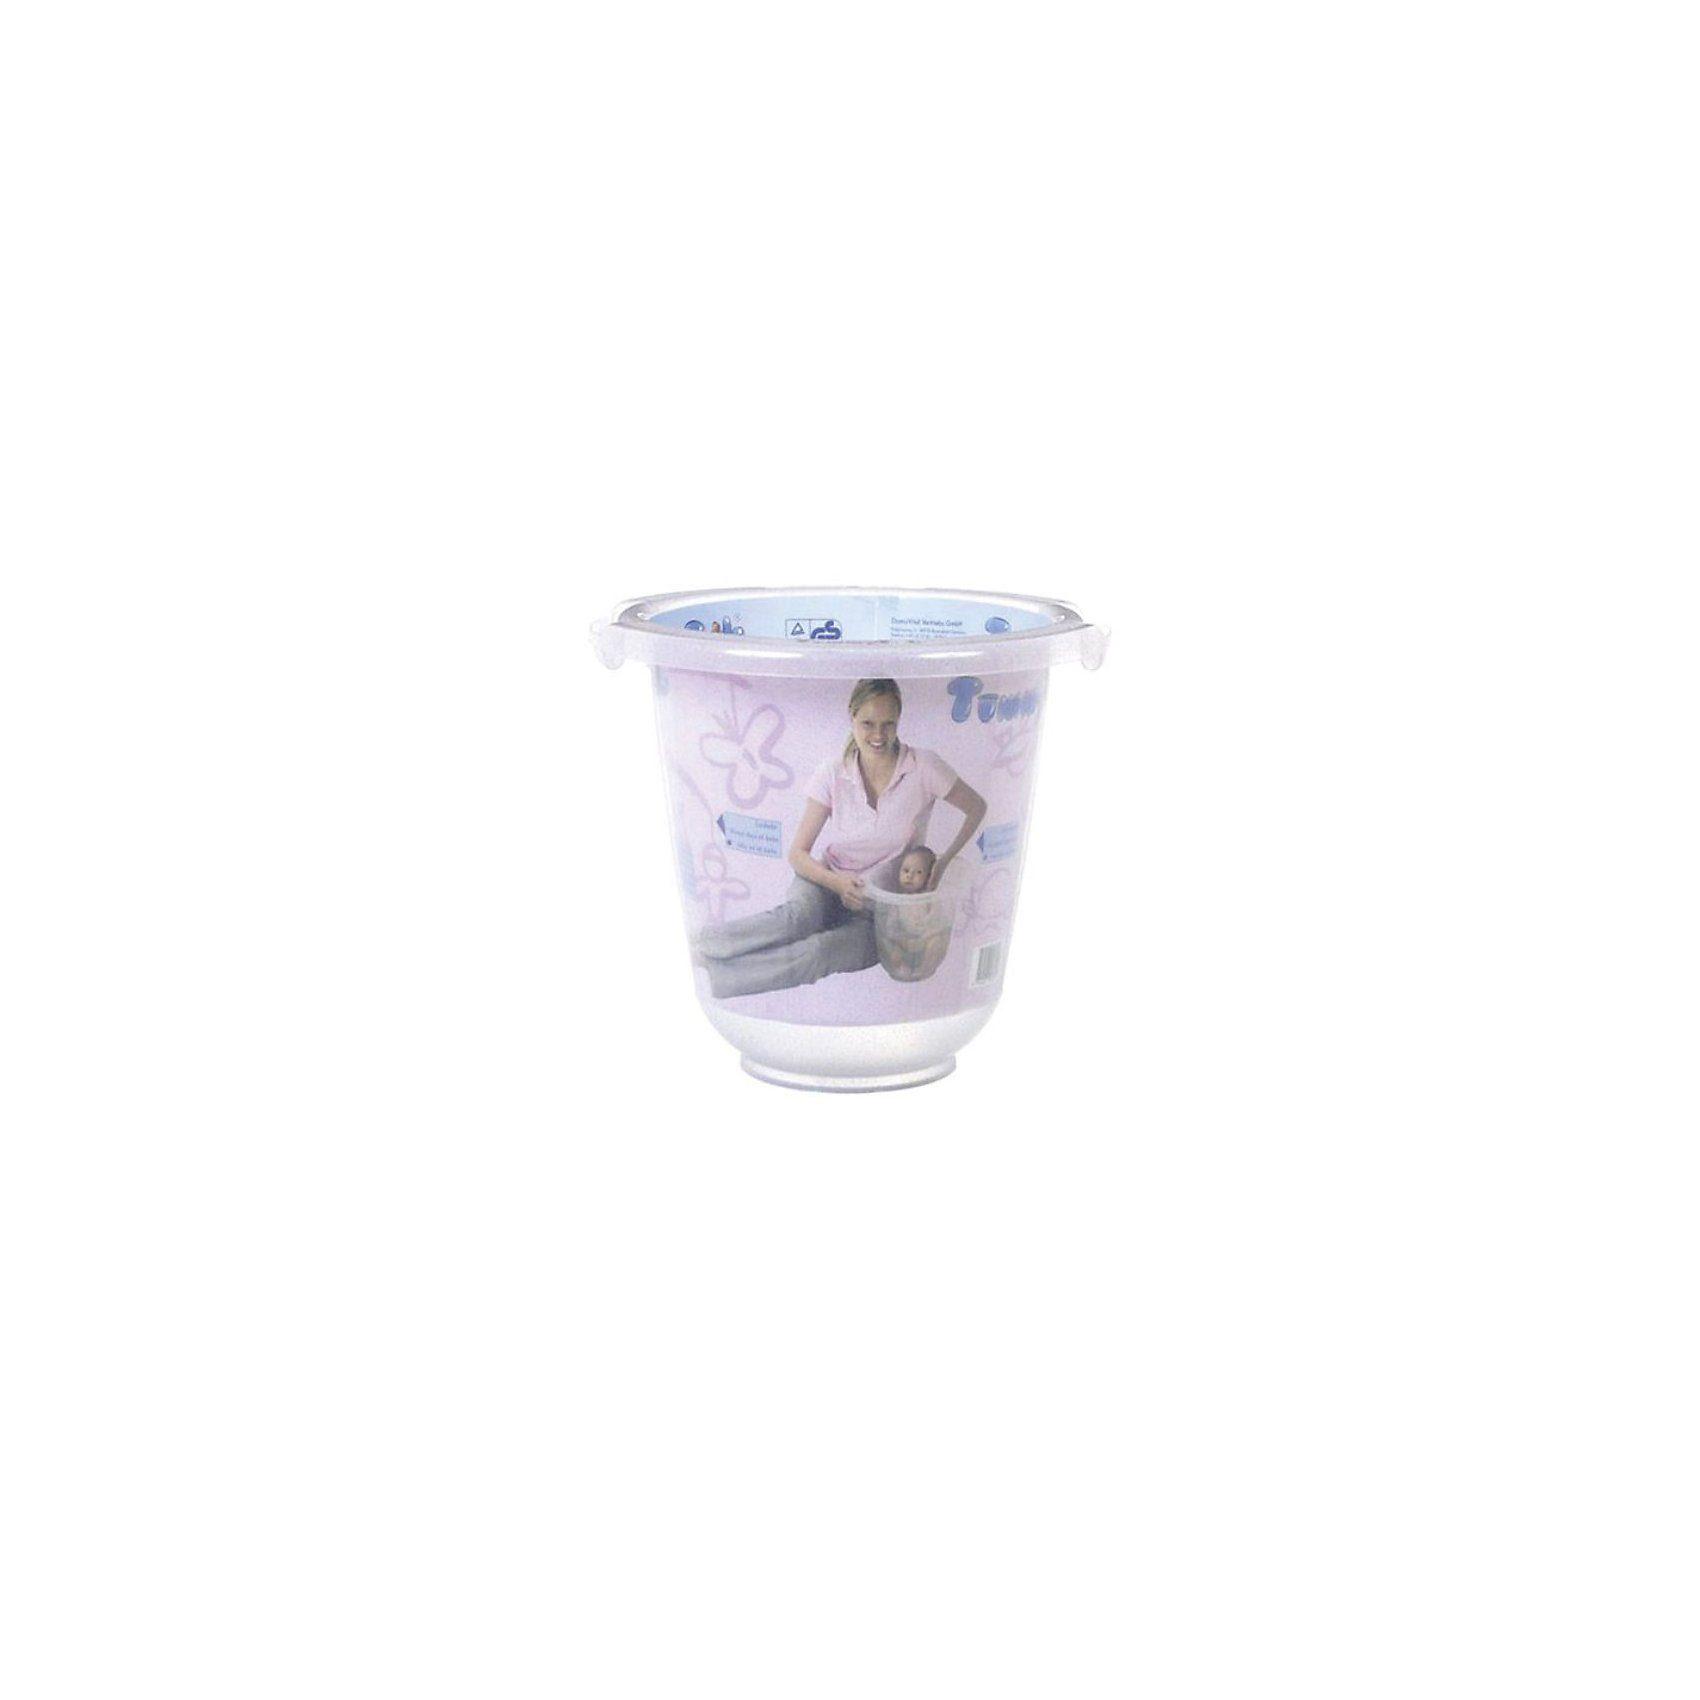 Tummy Tub Badeeimer , transparent